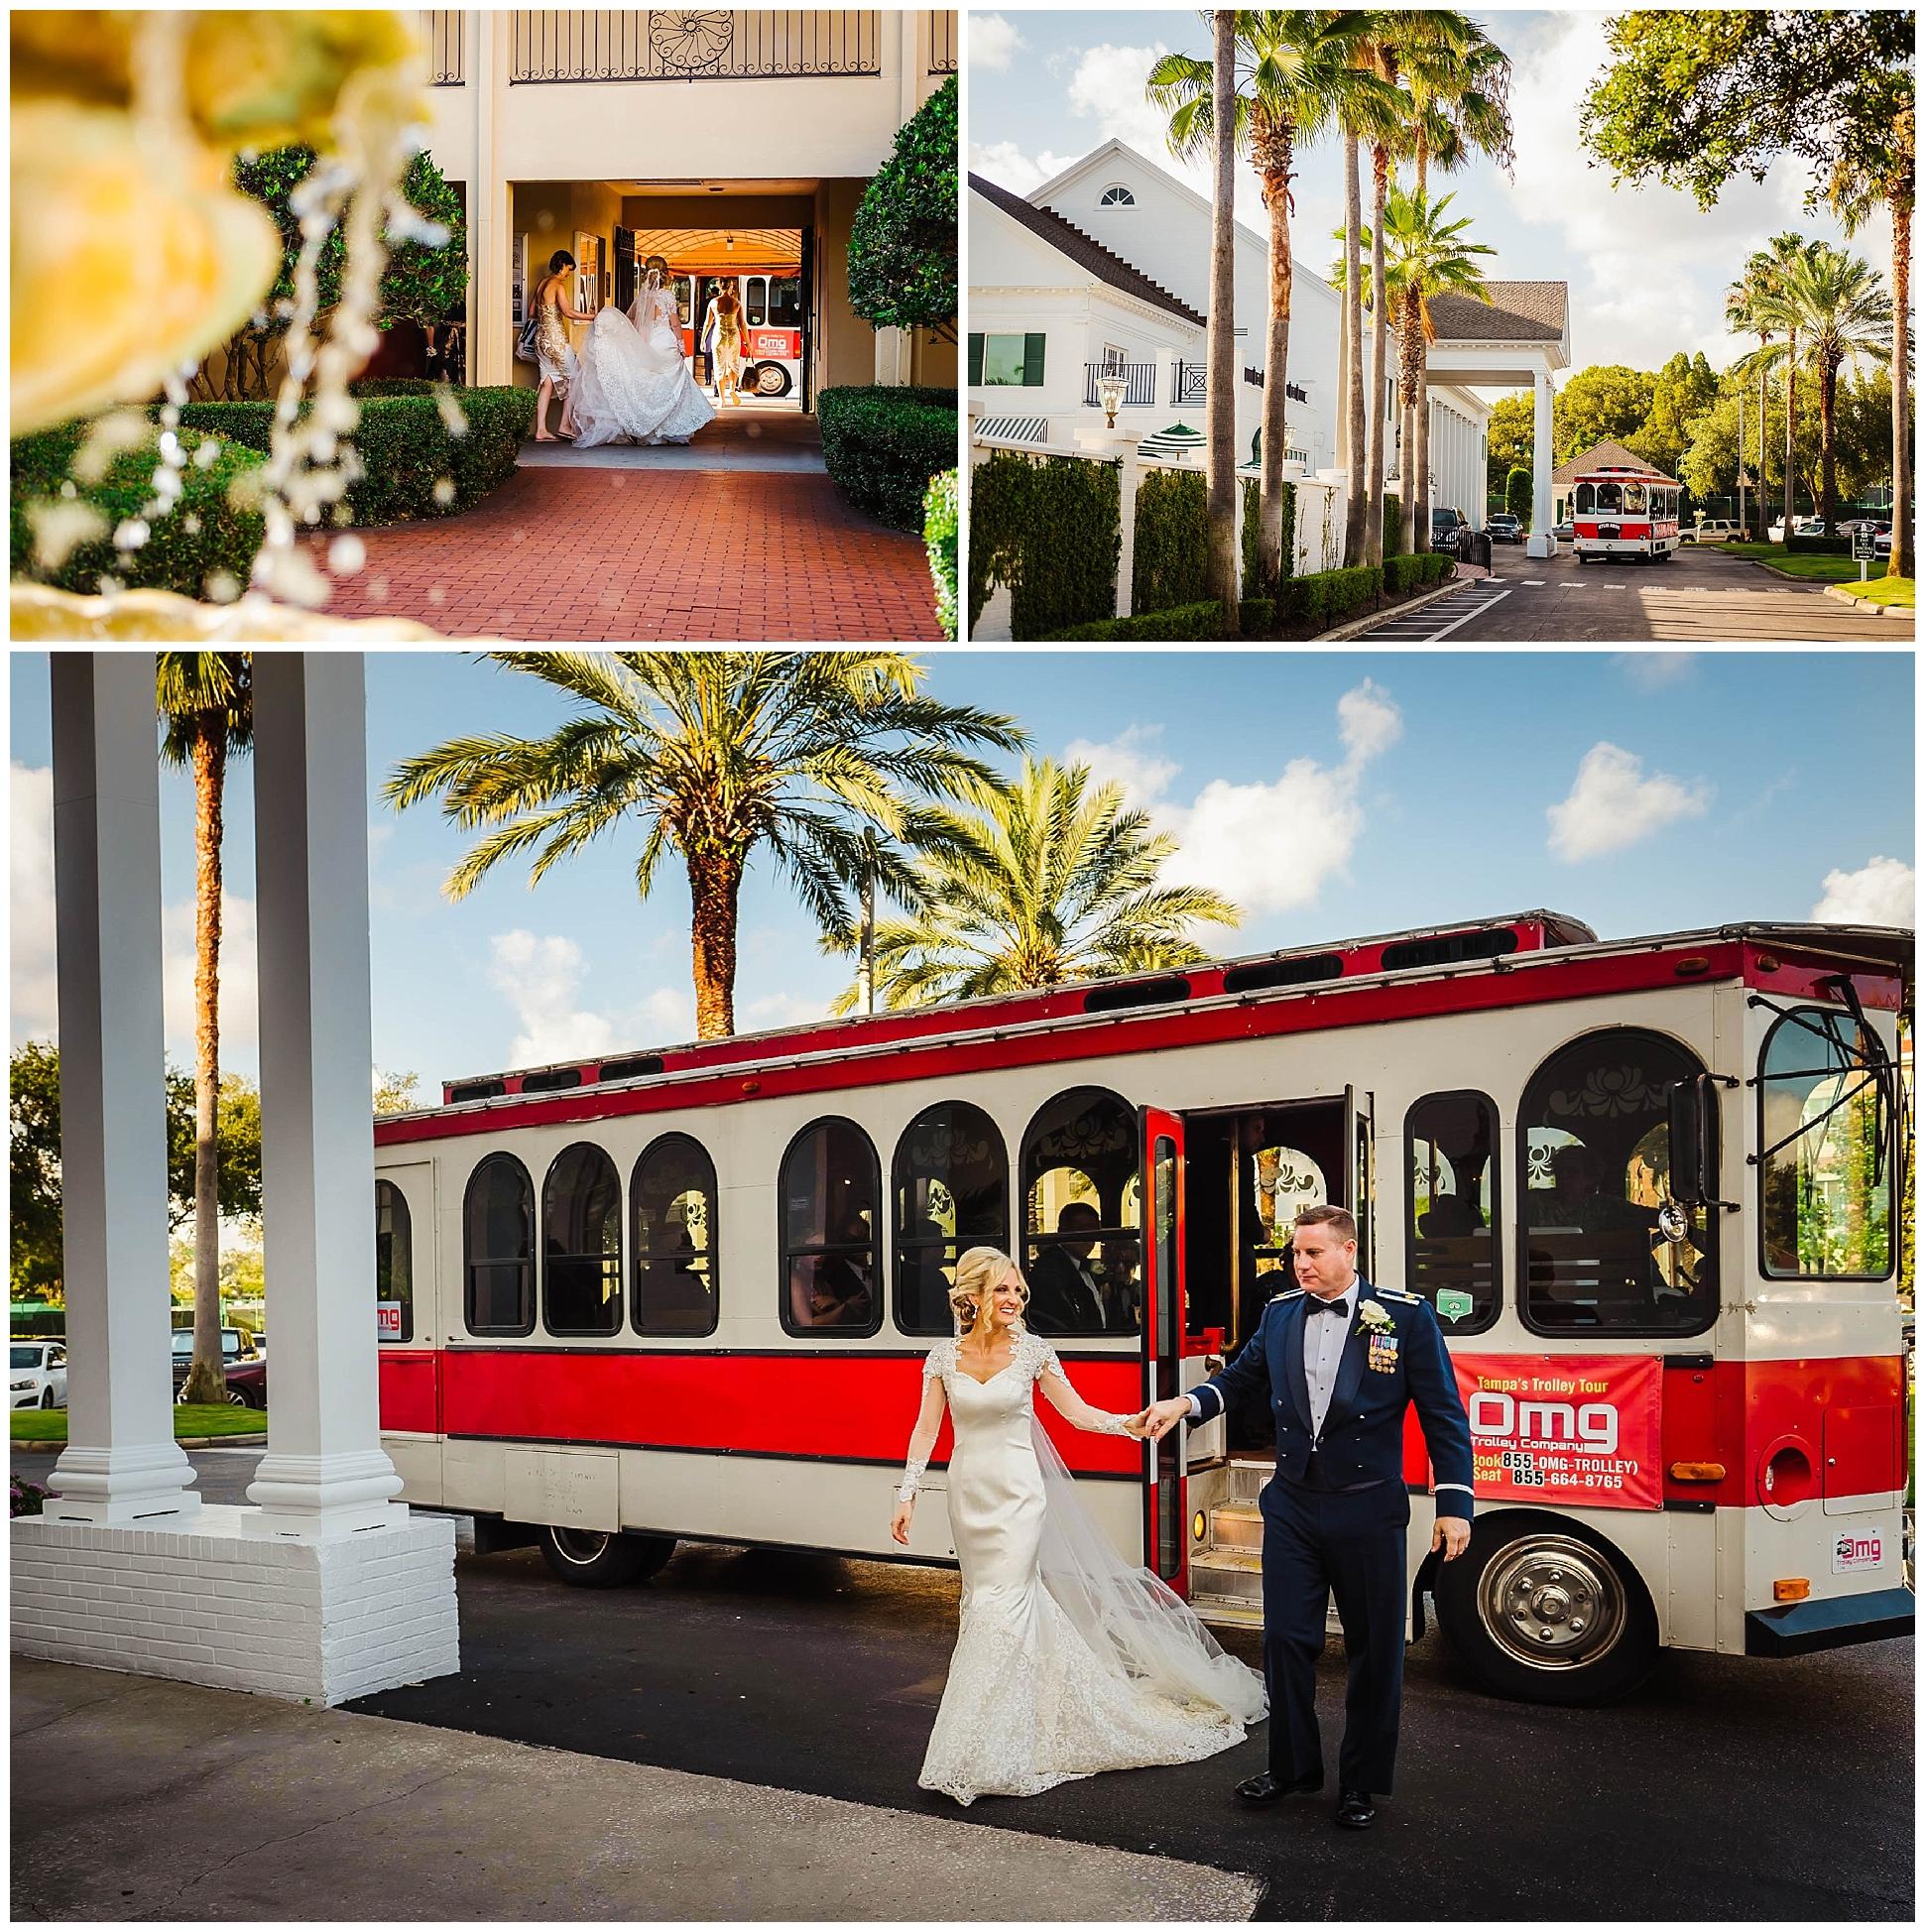 tampa-wedding-photographer-sleeves-palma-ceia-country-club-golf-course-sunset-luxury_0058.jpg